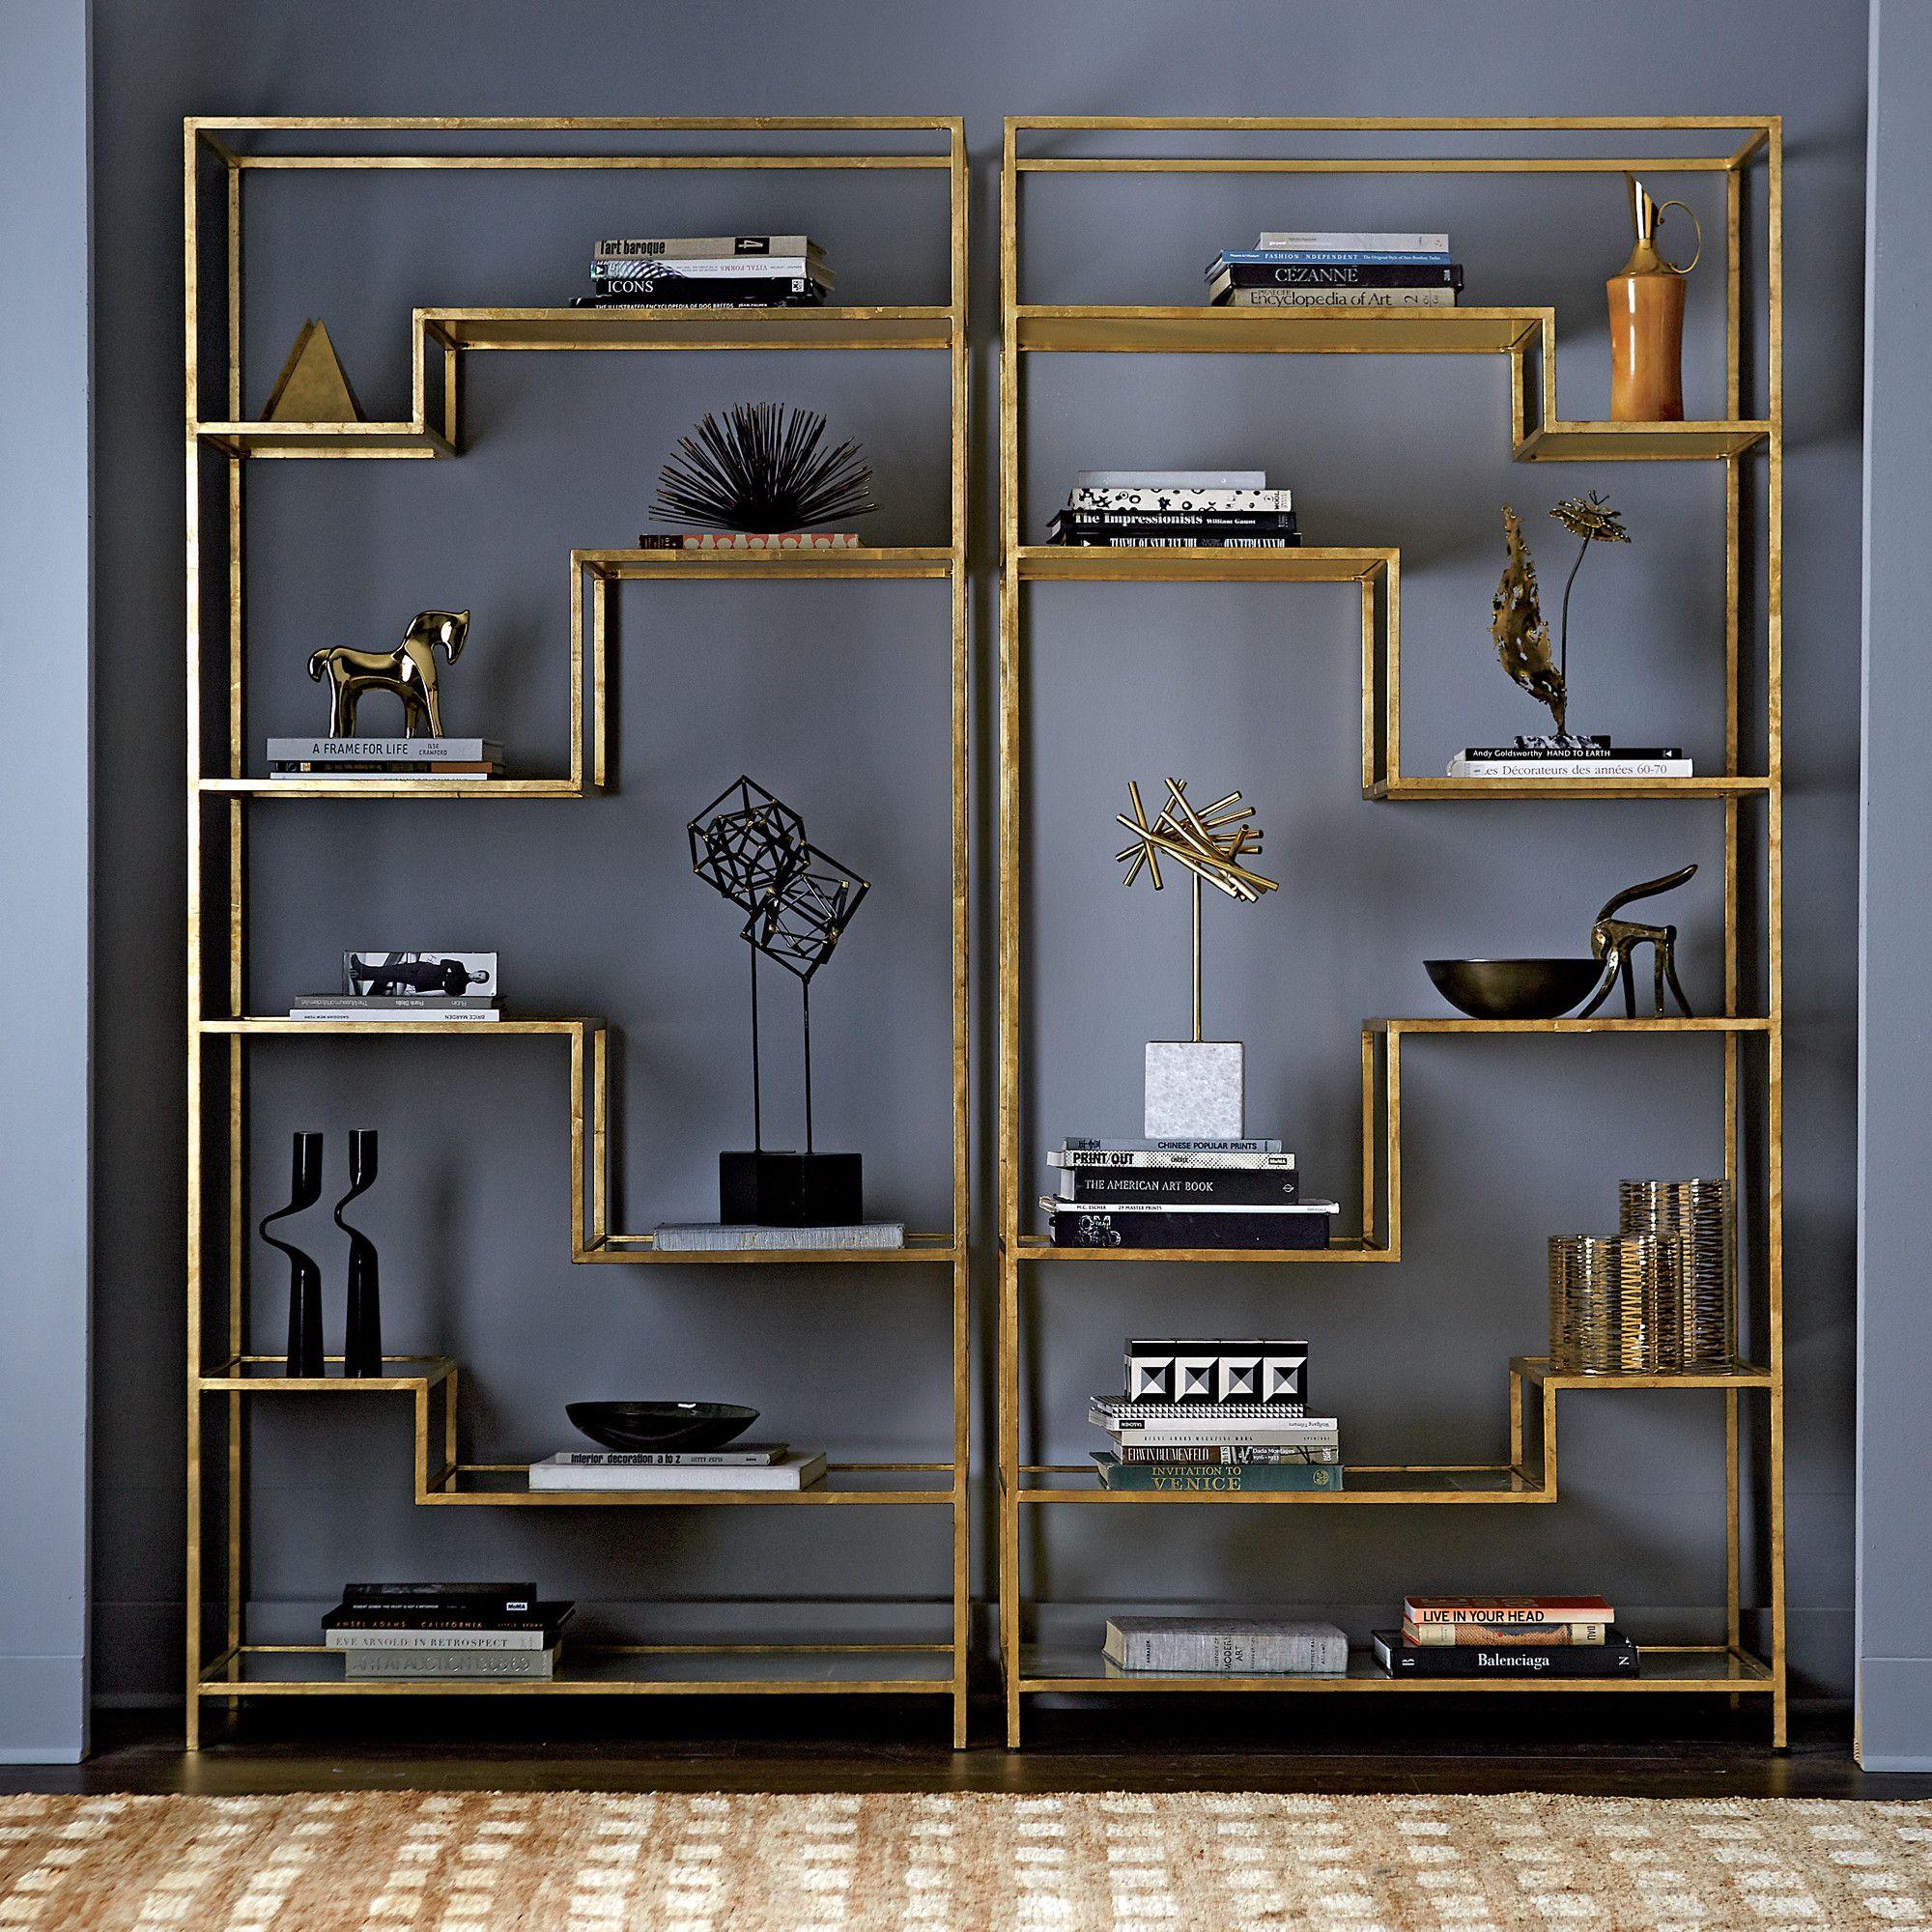 Dwellstudio modern furniture store home decor  contemporary interior design also rh co pinterest